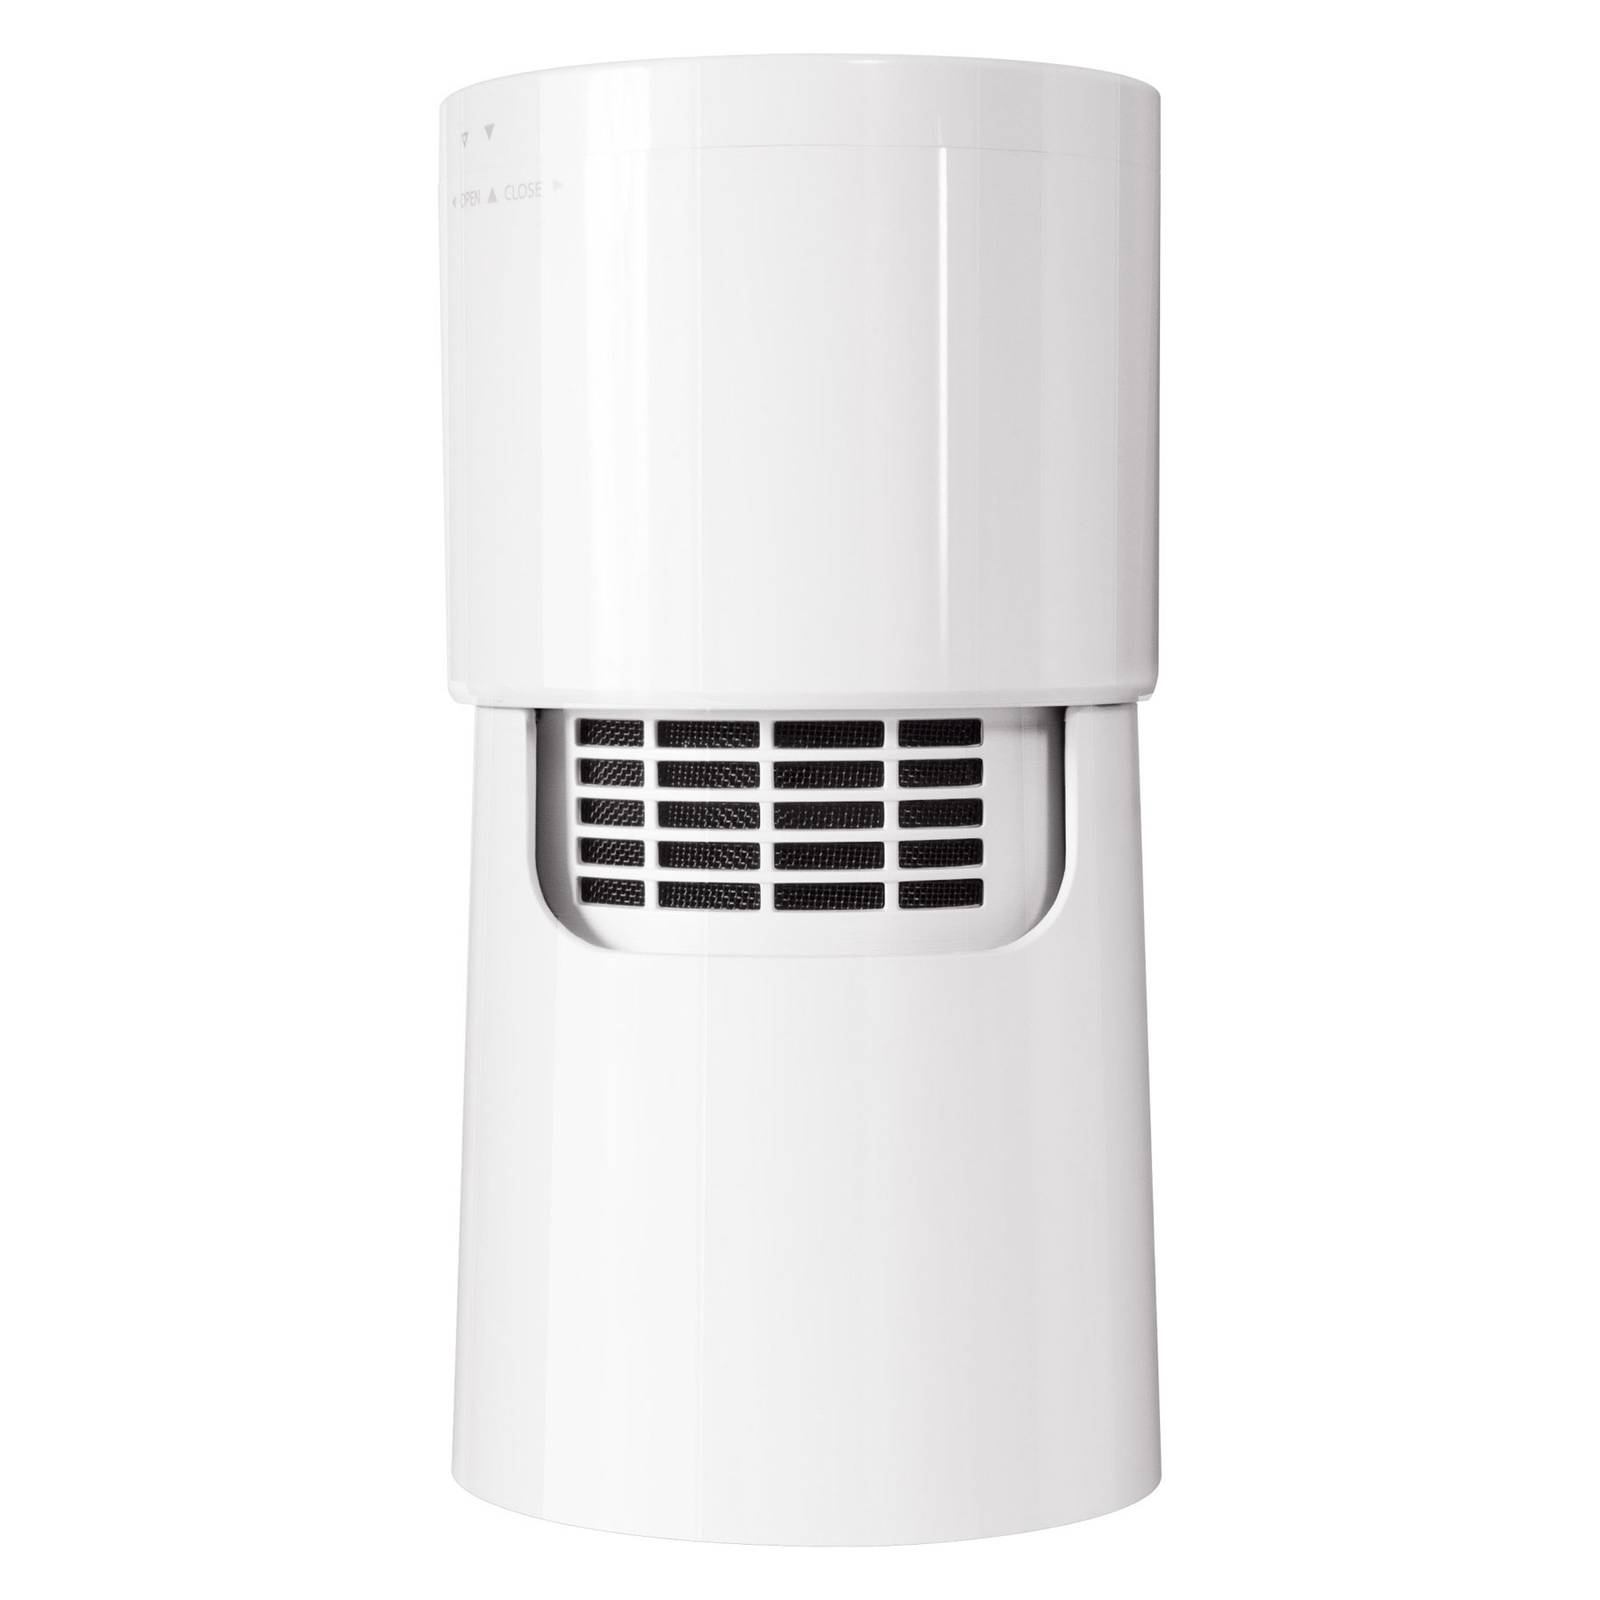 LEDVANCE UV-C depuratore d'aria filtro HEPA, USB